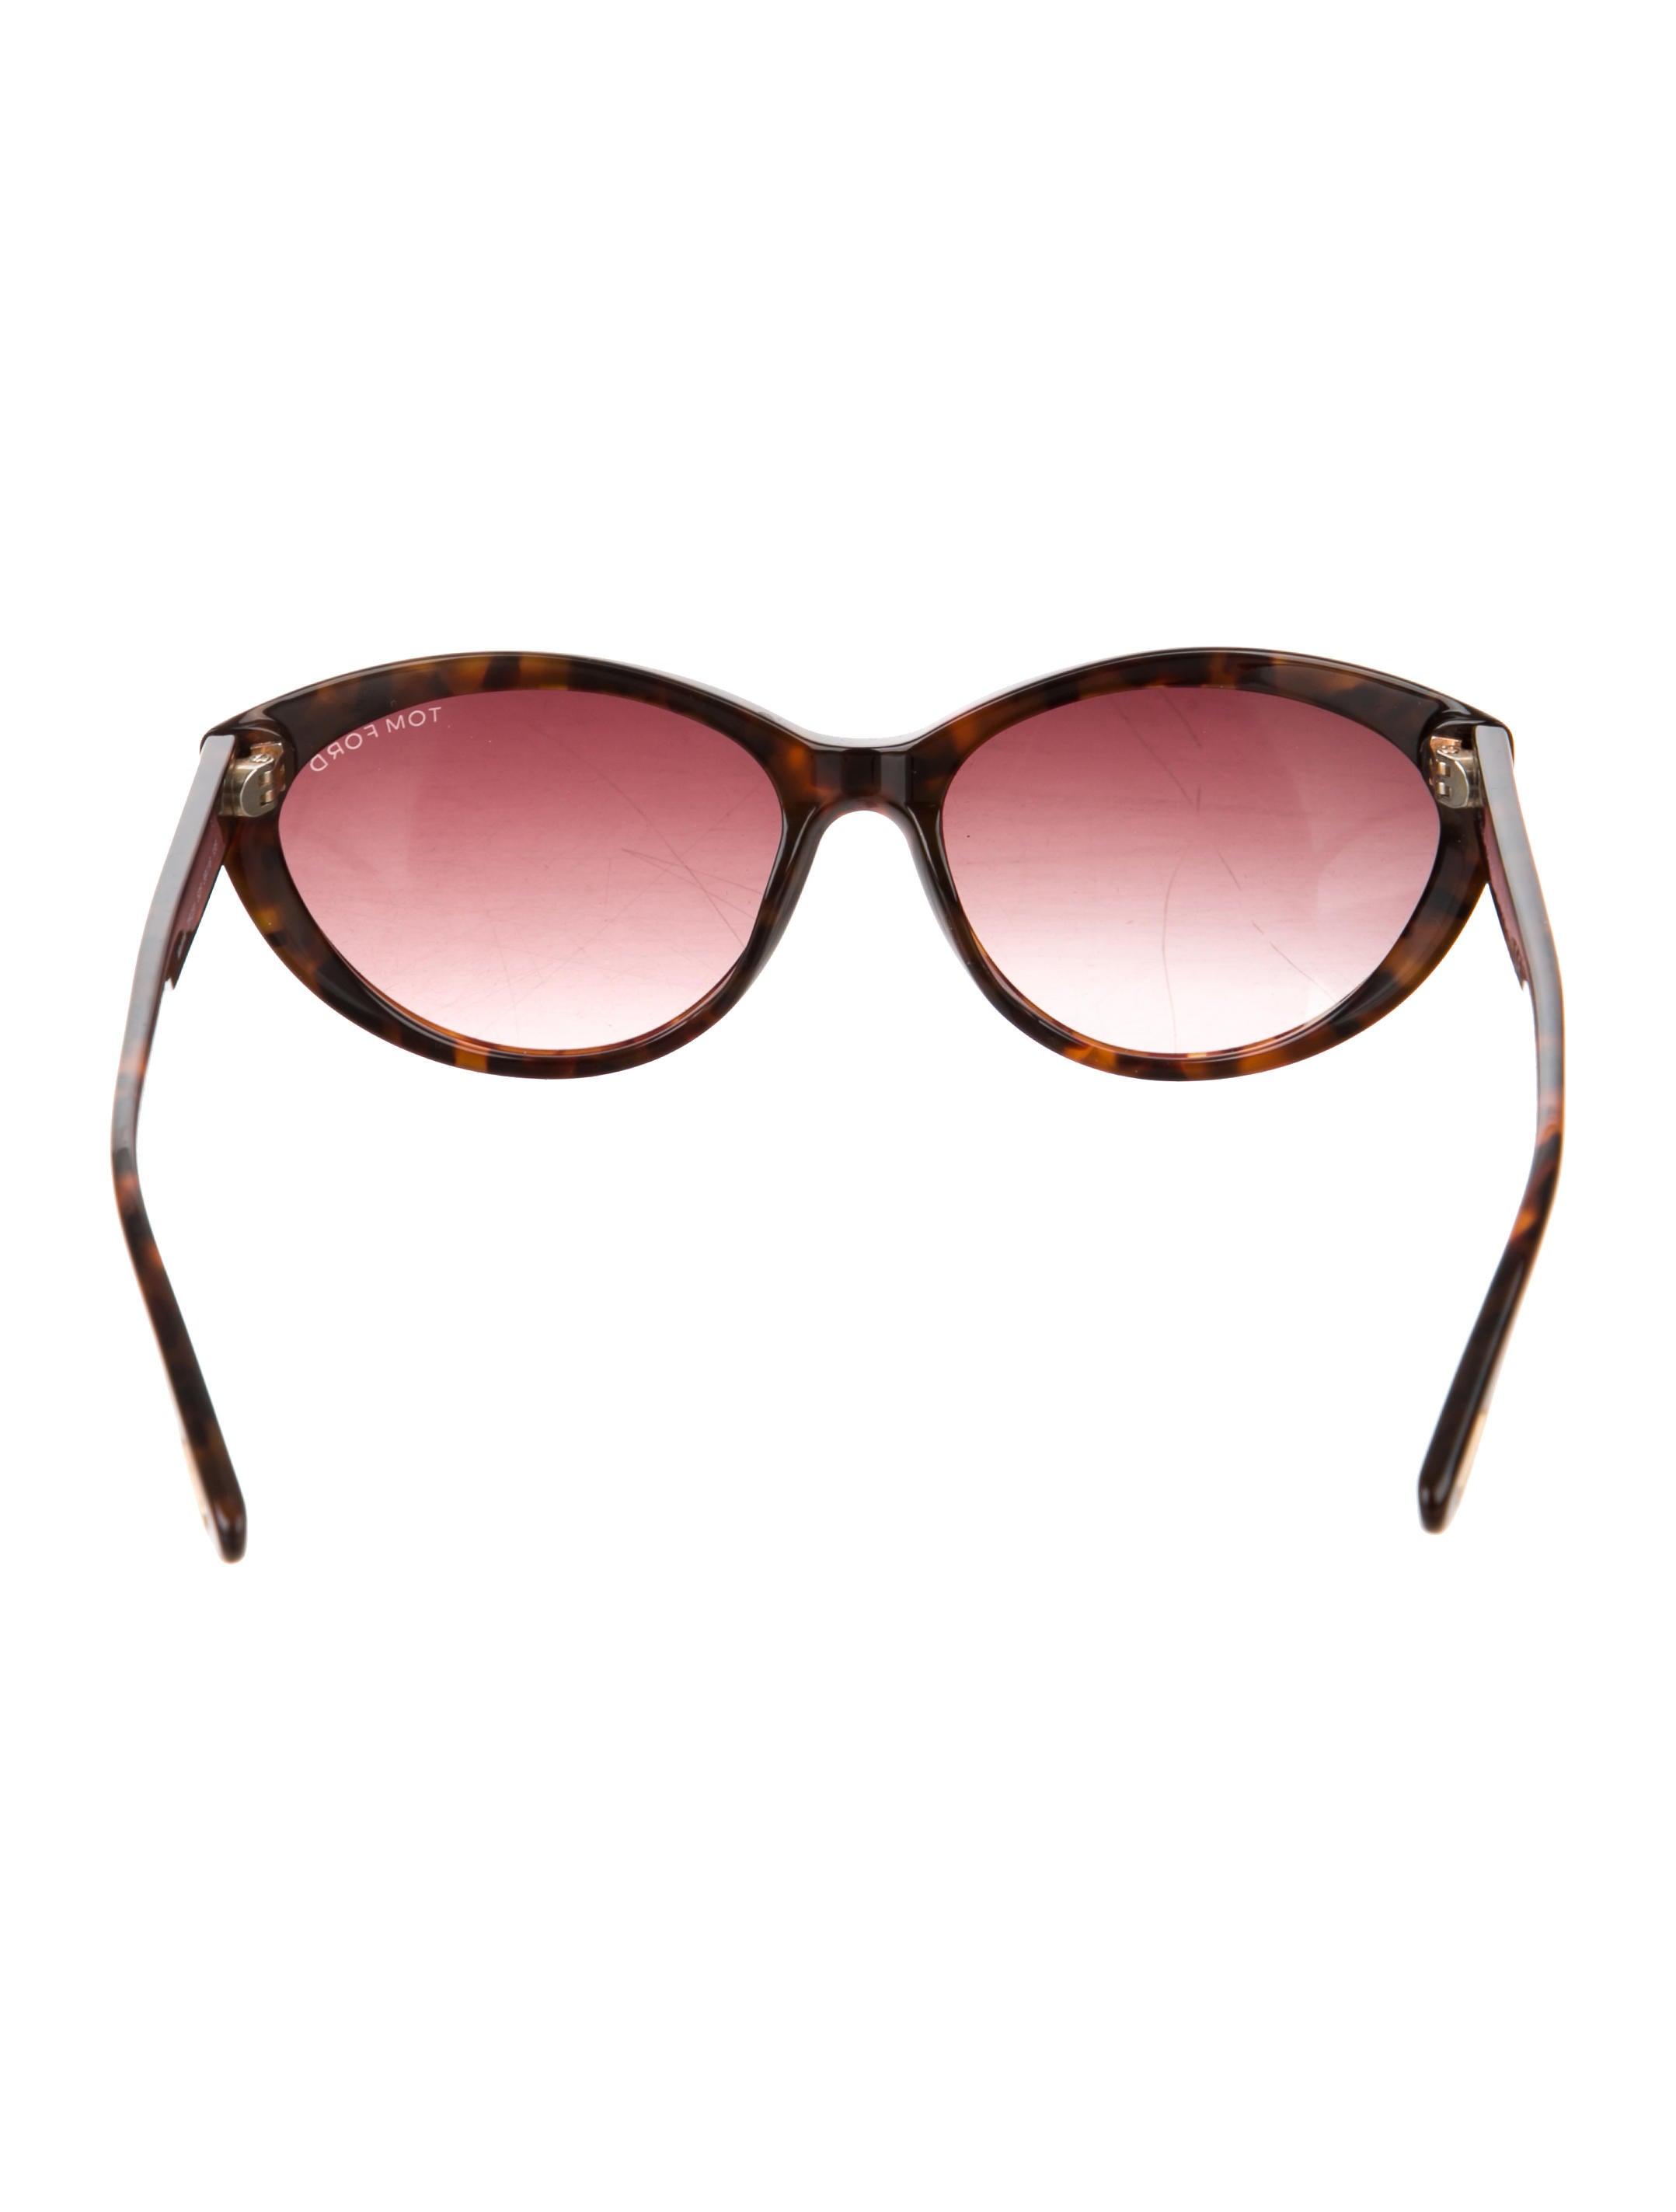 Tom Ford Tortoiseshell Cat Eye Sunglasses